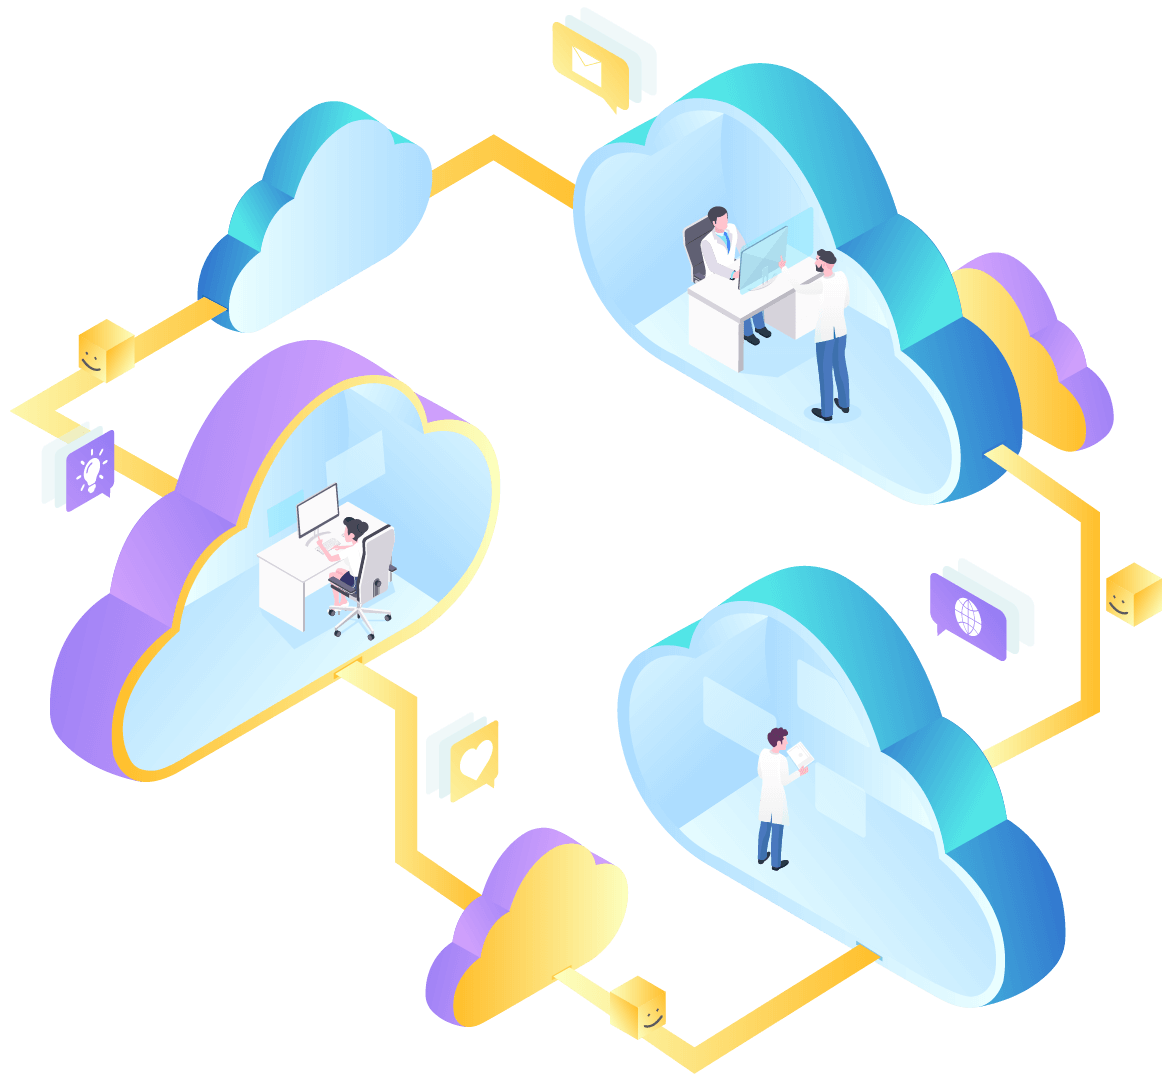 squad-microsoft-365-moln-illustration